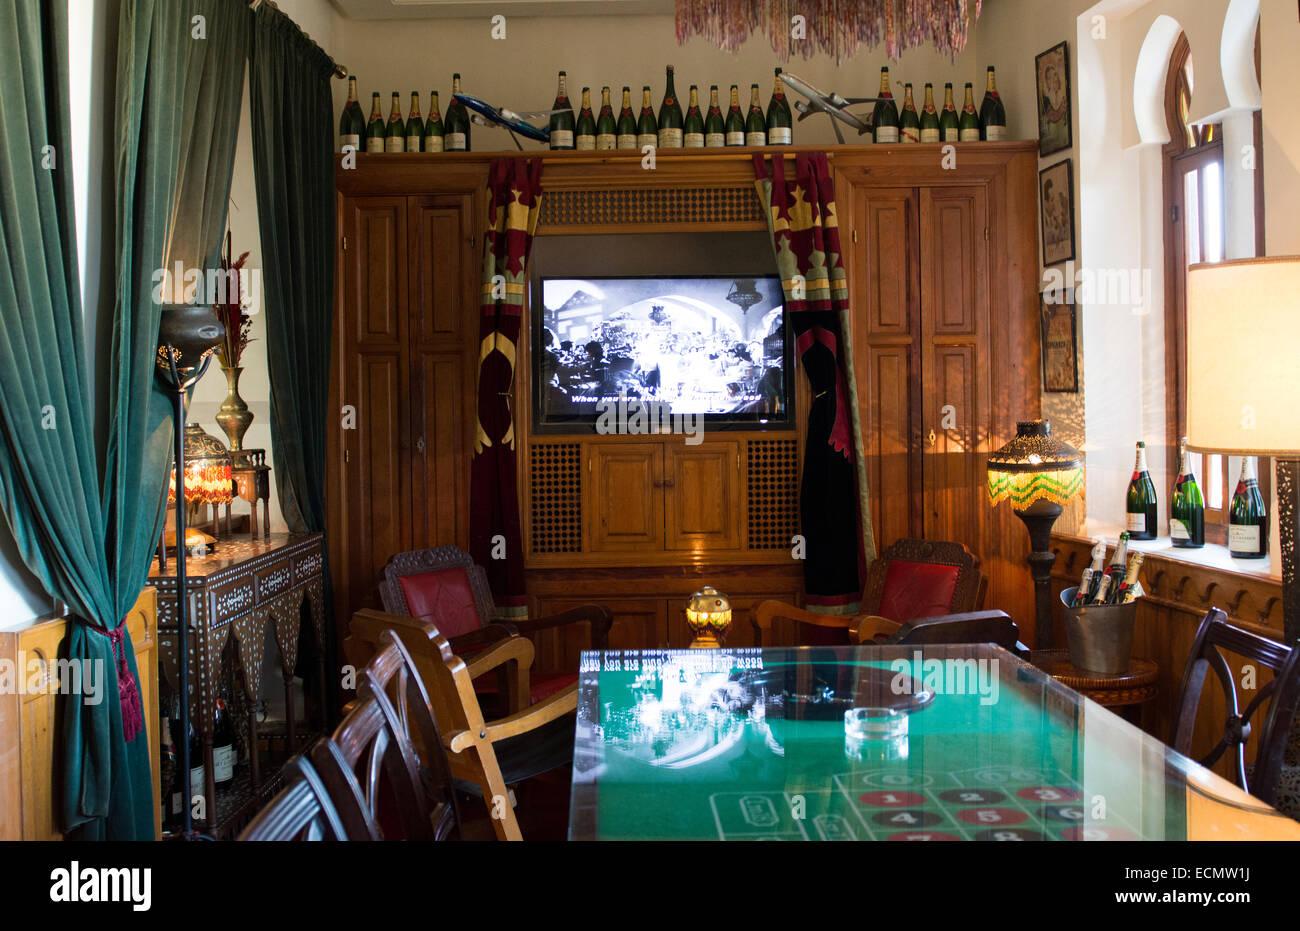 Ricks Cafe Casablanca Stock Photos Ricks Cafe Casablanca Stock  # Maroc New Tv